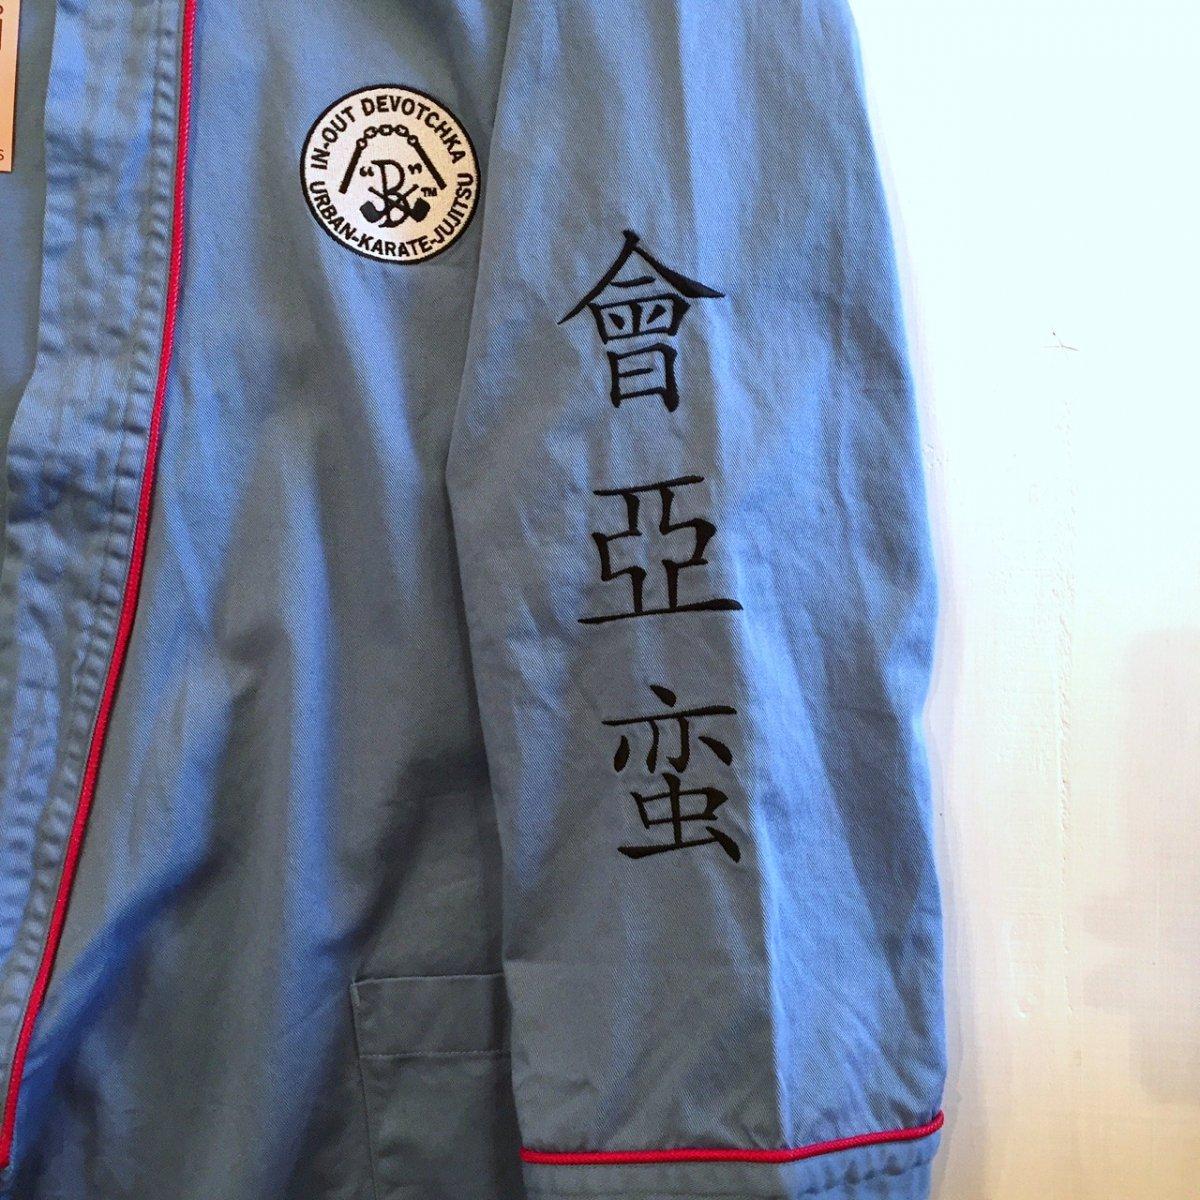 <img class='new_mark_img1' src='https://img.shop-pro.jp/img/new/icons3.gif' style='border:none;display:inline;margin:0px;padding:0px;width:auto;' />Black weirdos  ブラック ウィドー / ジャケット DO-GI (Martial Arts Uniform) Shirt 【SAX】